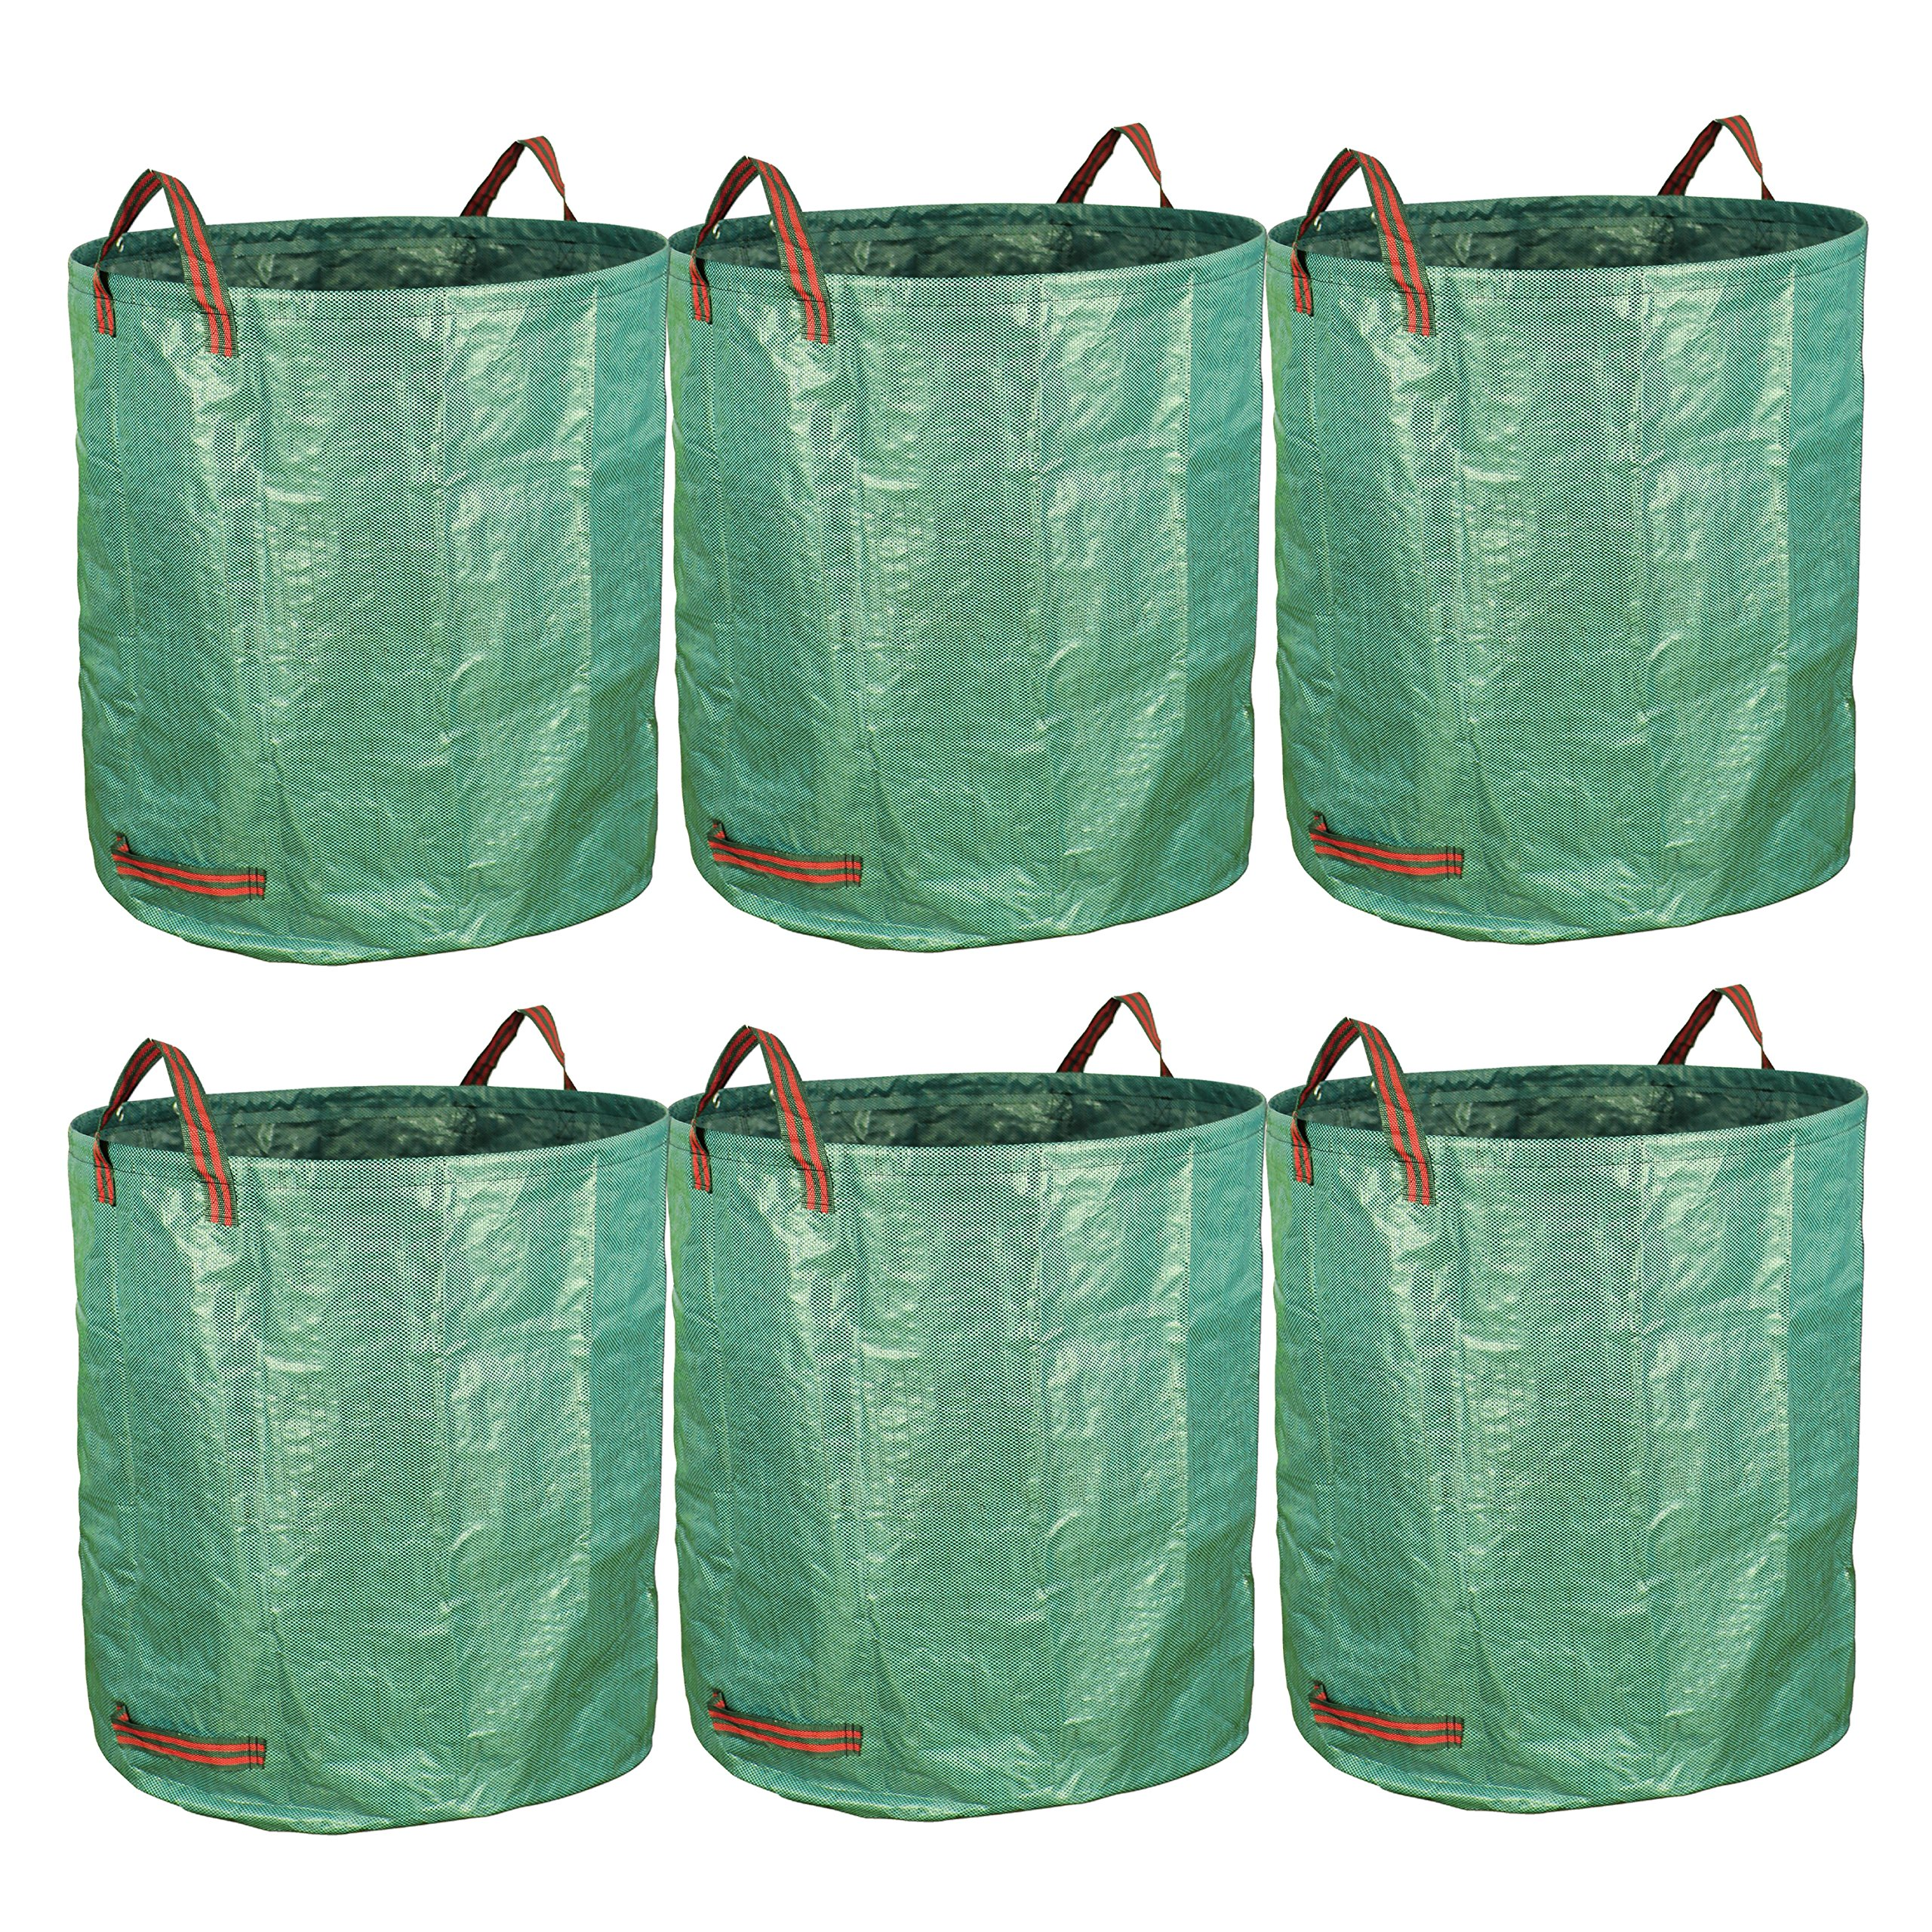 gardzen 6-Pack 72 Gallon Bags - Reuseable Heavy Duty Gardening Bags, Lawn Pool Garden Leaf Waste Bag by gardzen